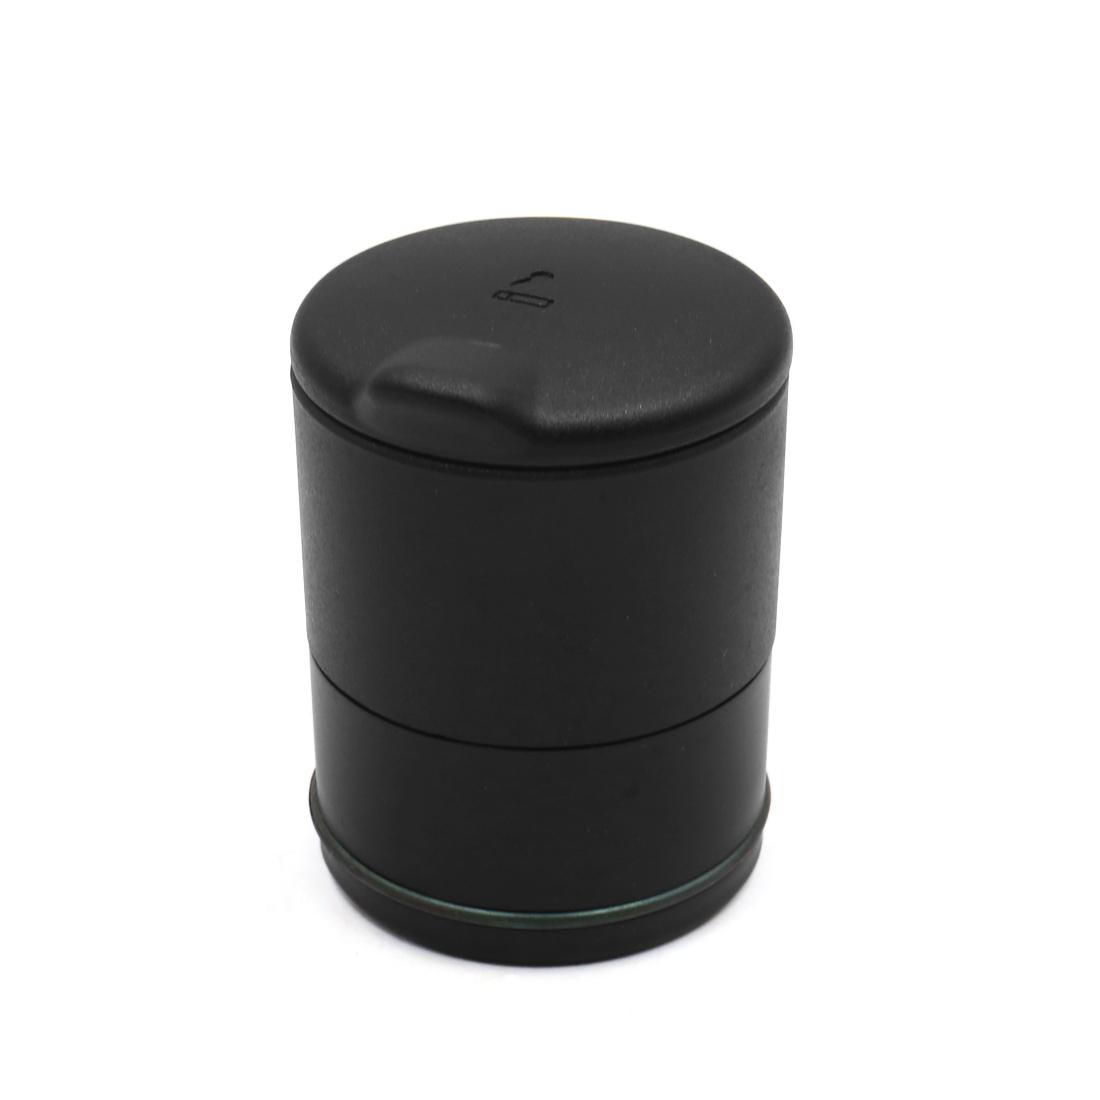 Black Plastic Portable Casing Auto Car Smoking Cigarette Ashtray Holder